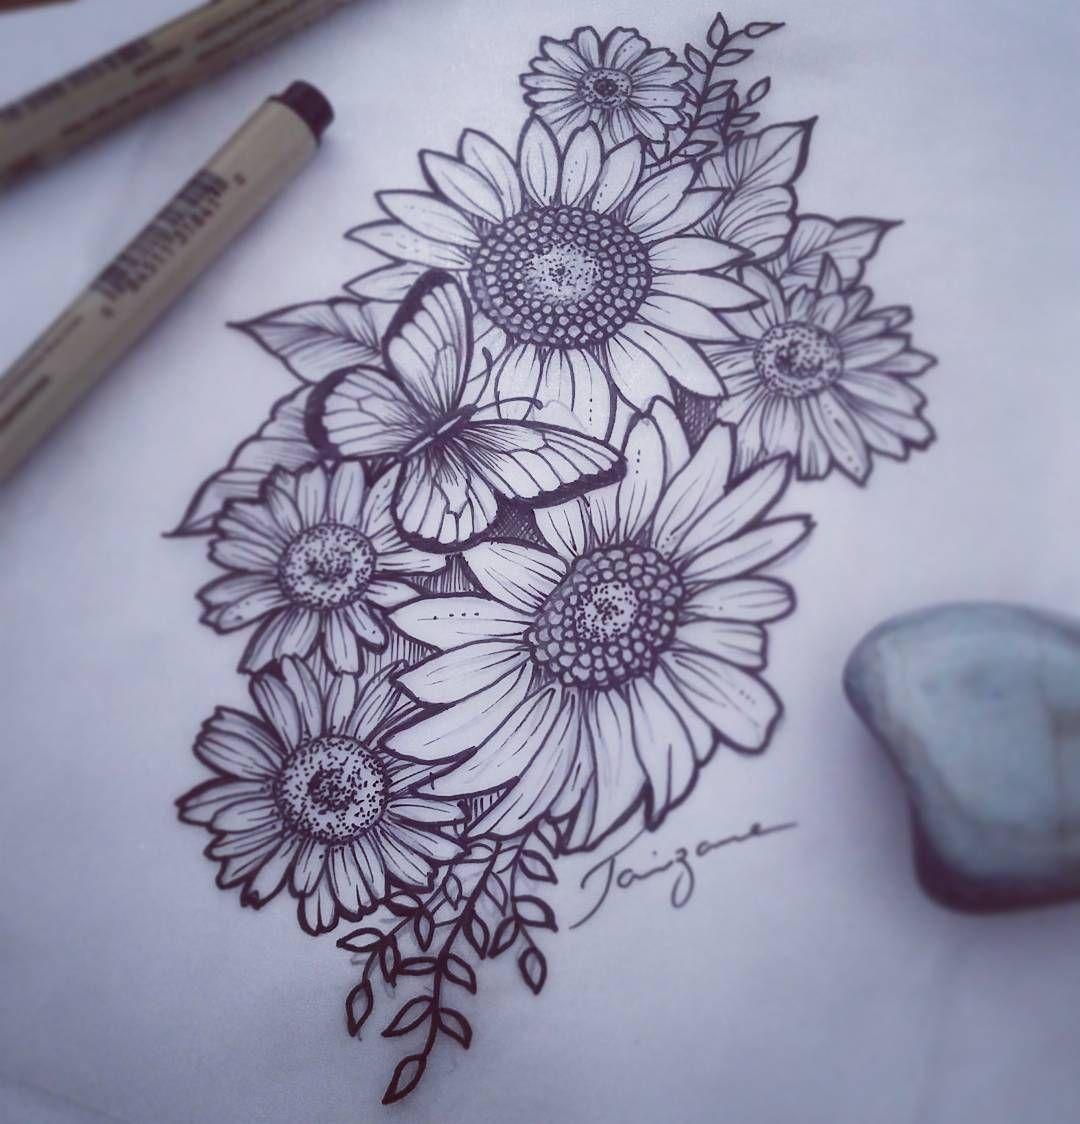 "Taizane - Tattoo Vibracional on Instagram: ""Tattoo floral... Girassóis com margaridas! 💗💗💗 #floraltattoo #girassoltattoo #tattoodesign #taizane"""